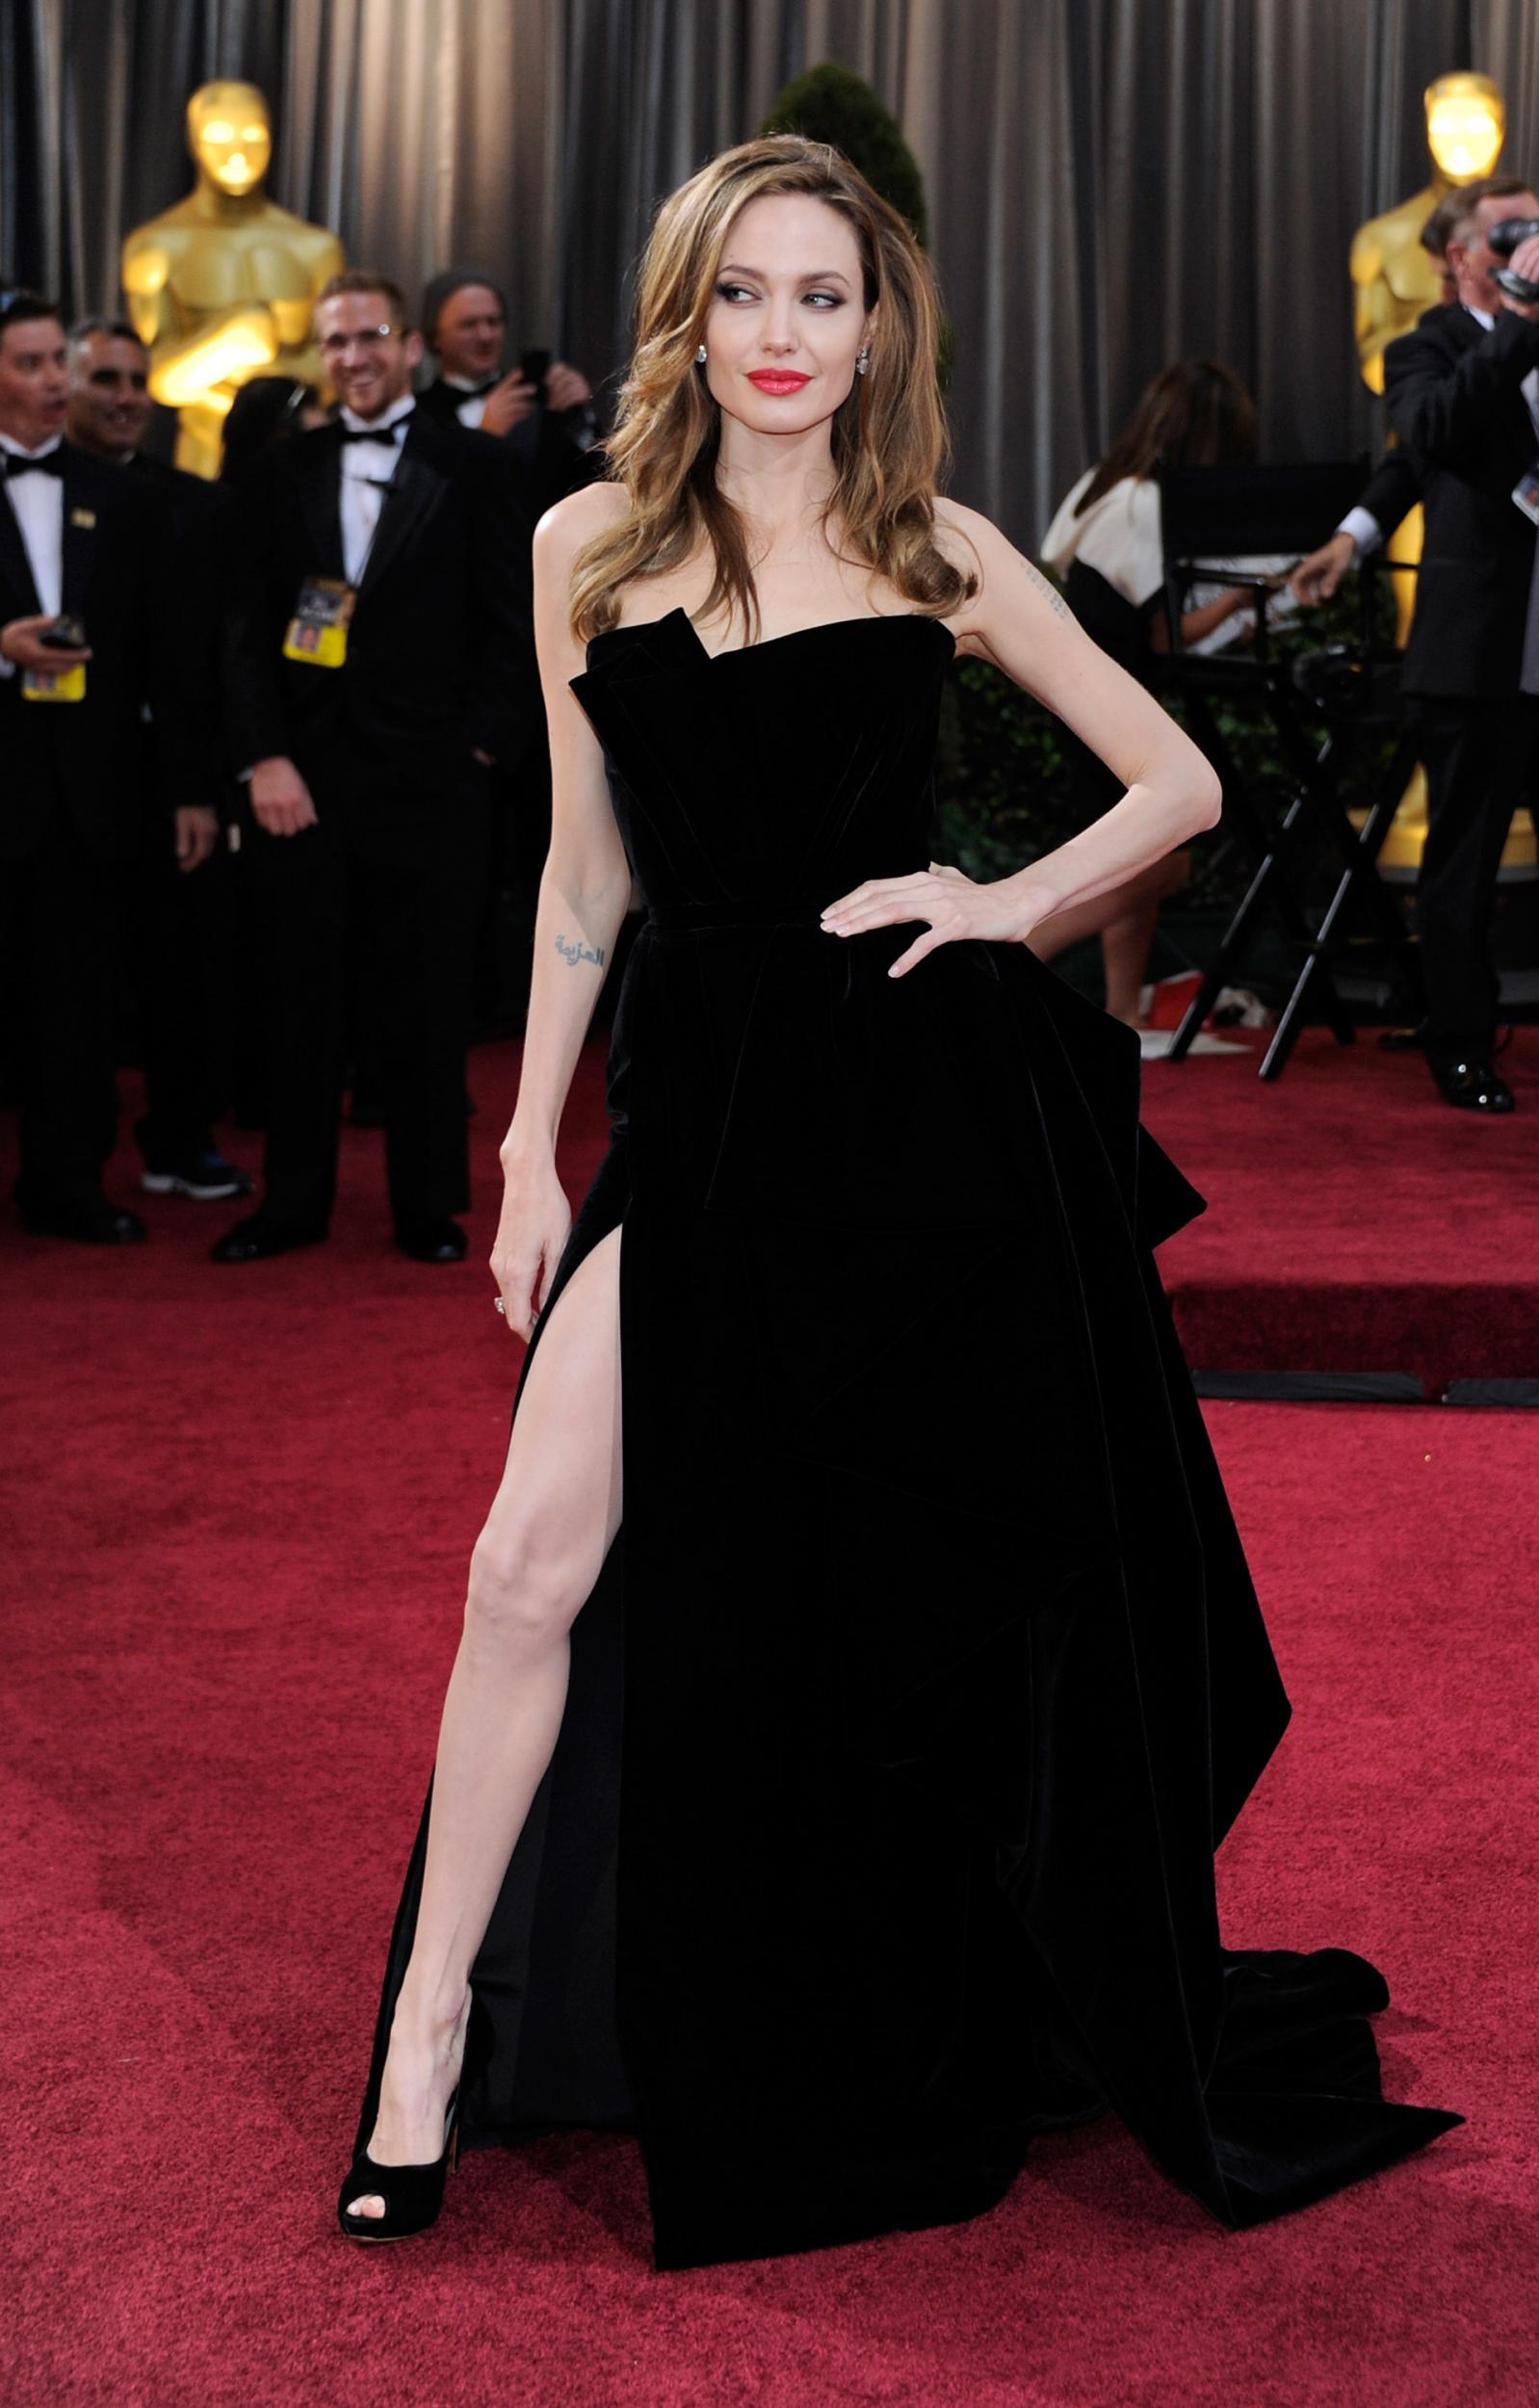 11 - Angelina Jolie's 'leg' dress, Versace, 2012